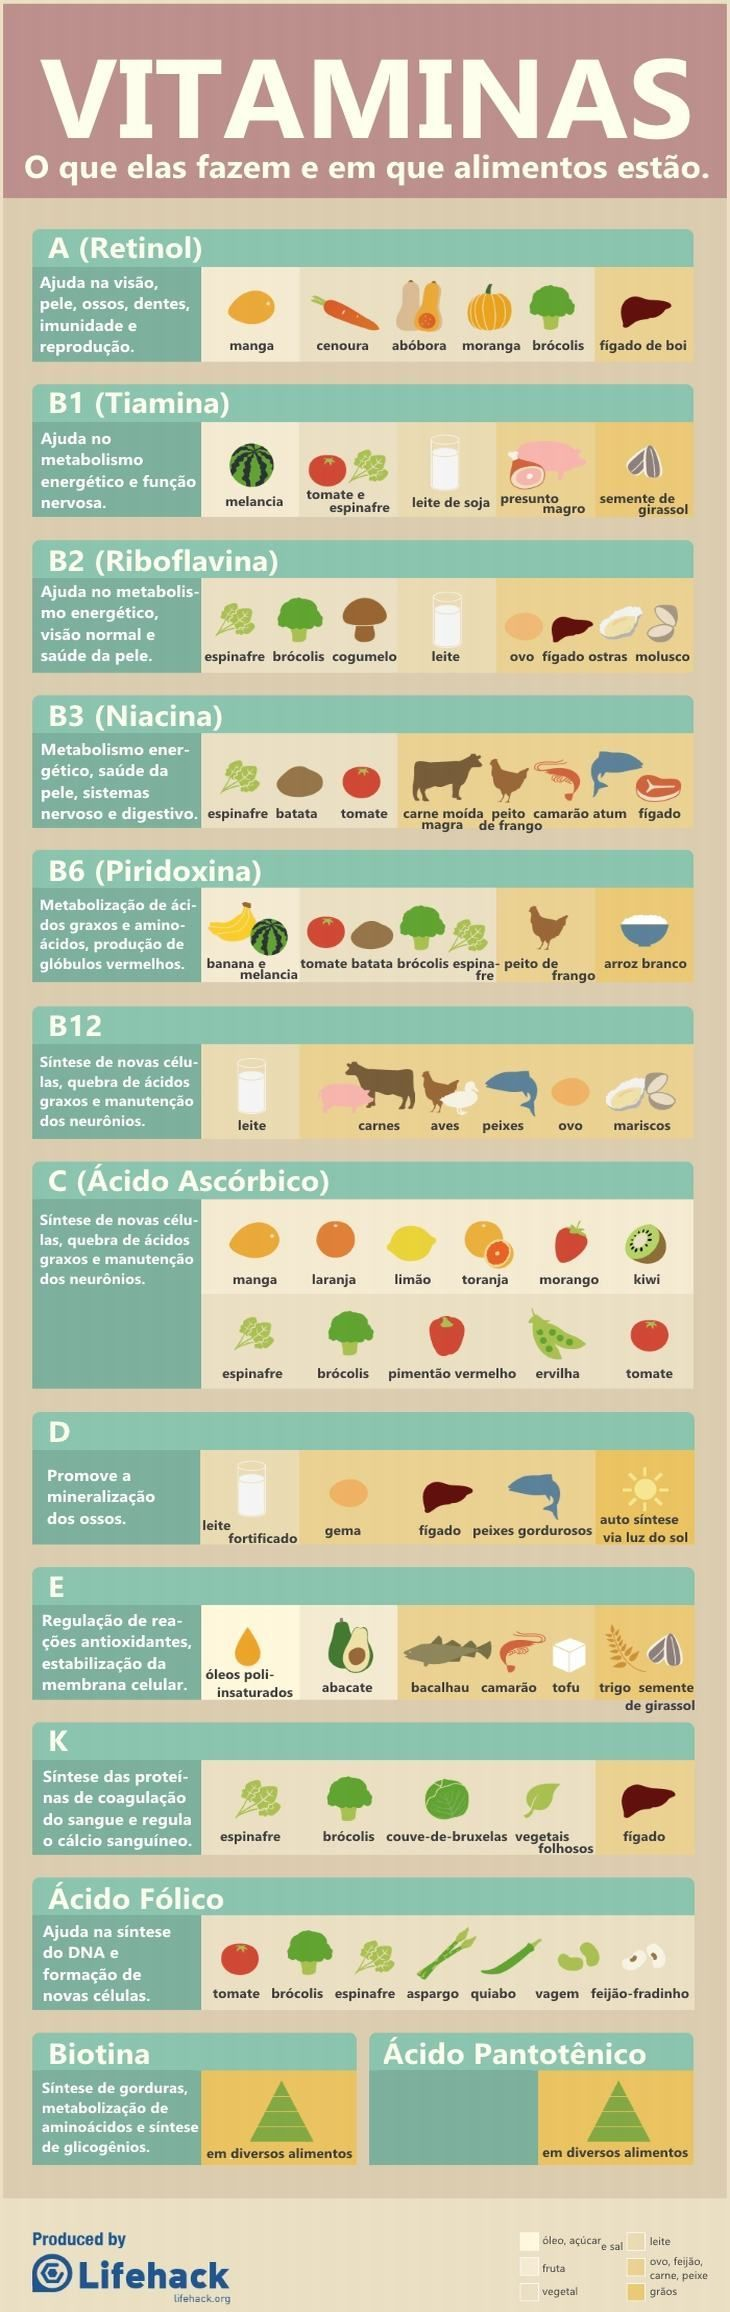 infographic vitamínov tudoporemail